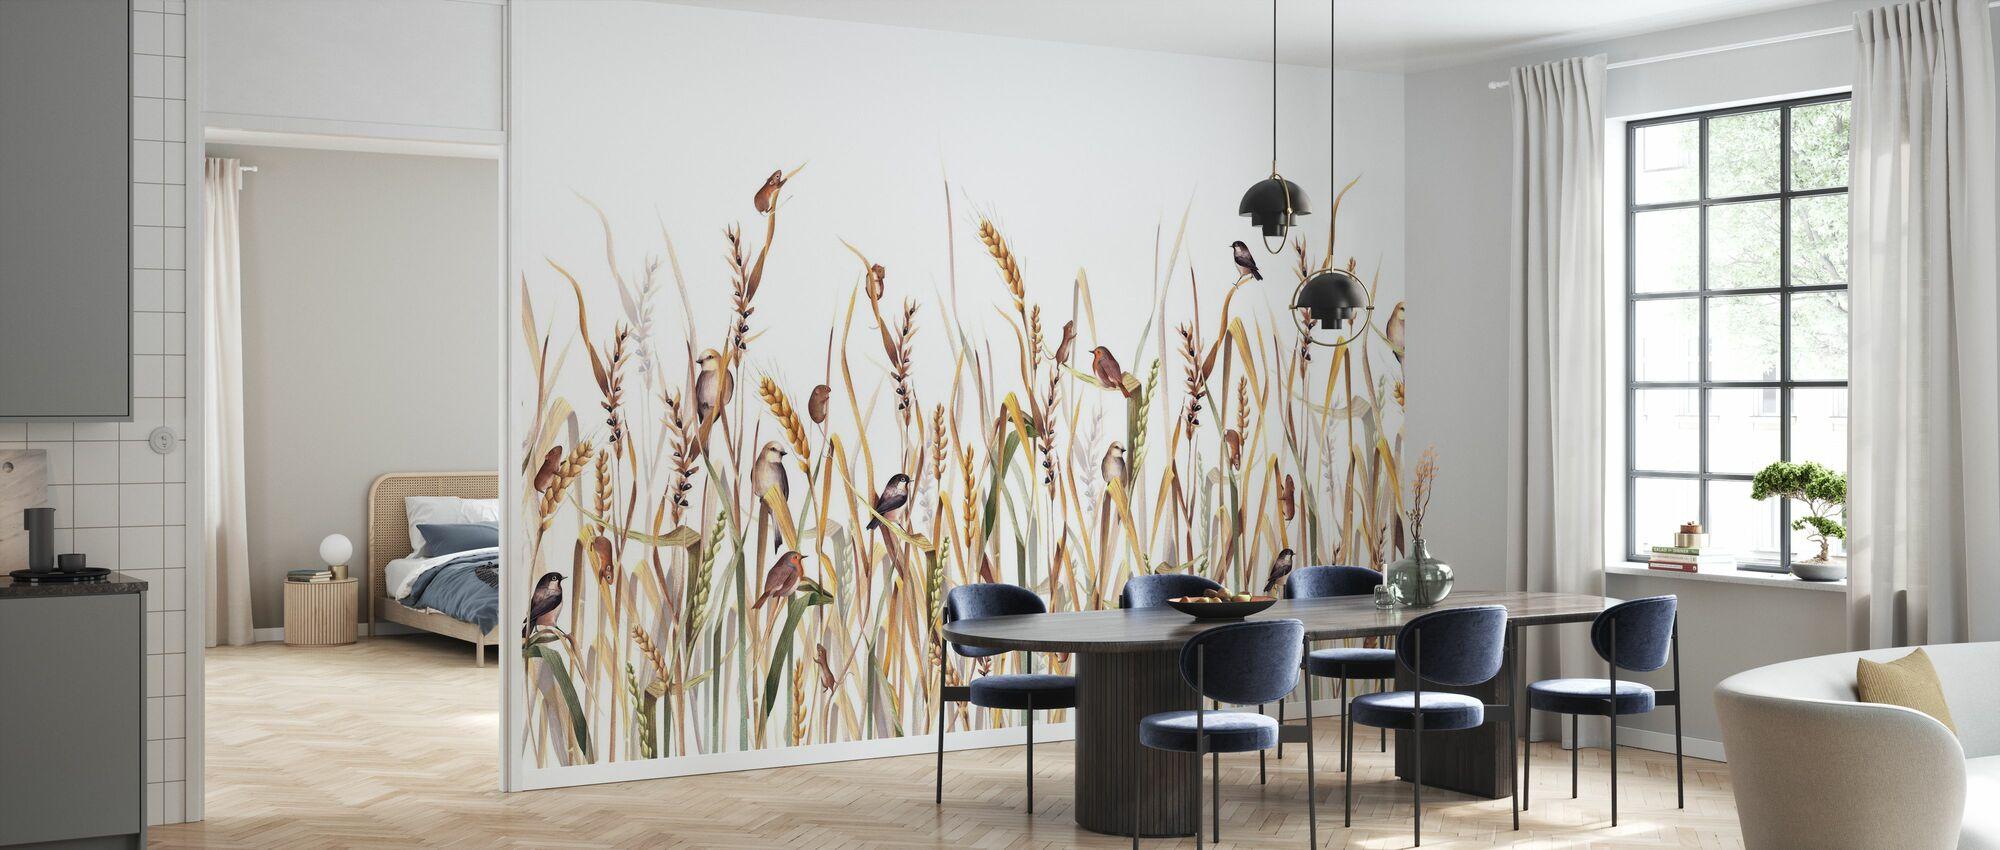 Friends in the Grass - Wallpaper - Kitchen